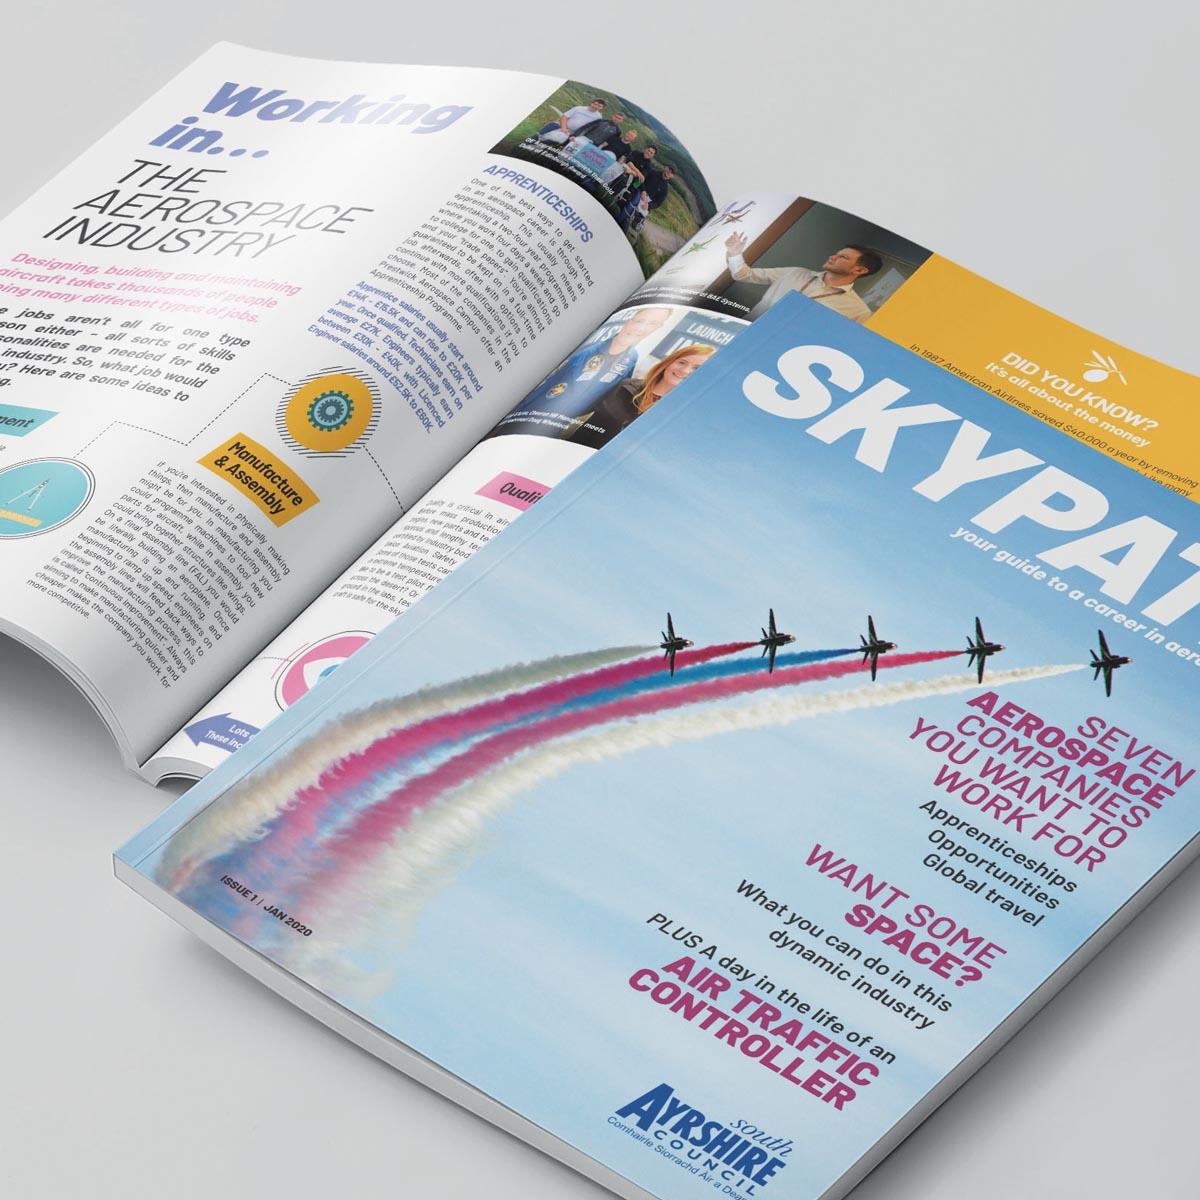 Skypath magazine publication design